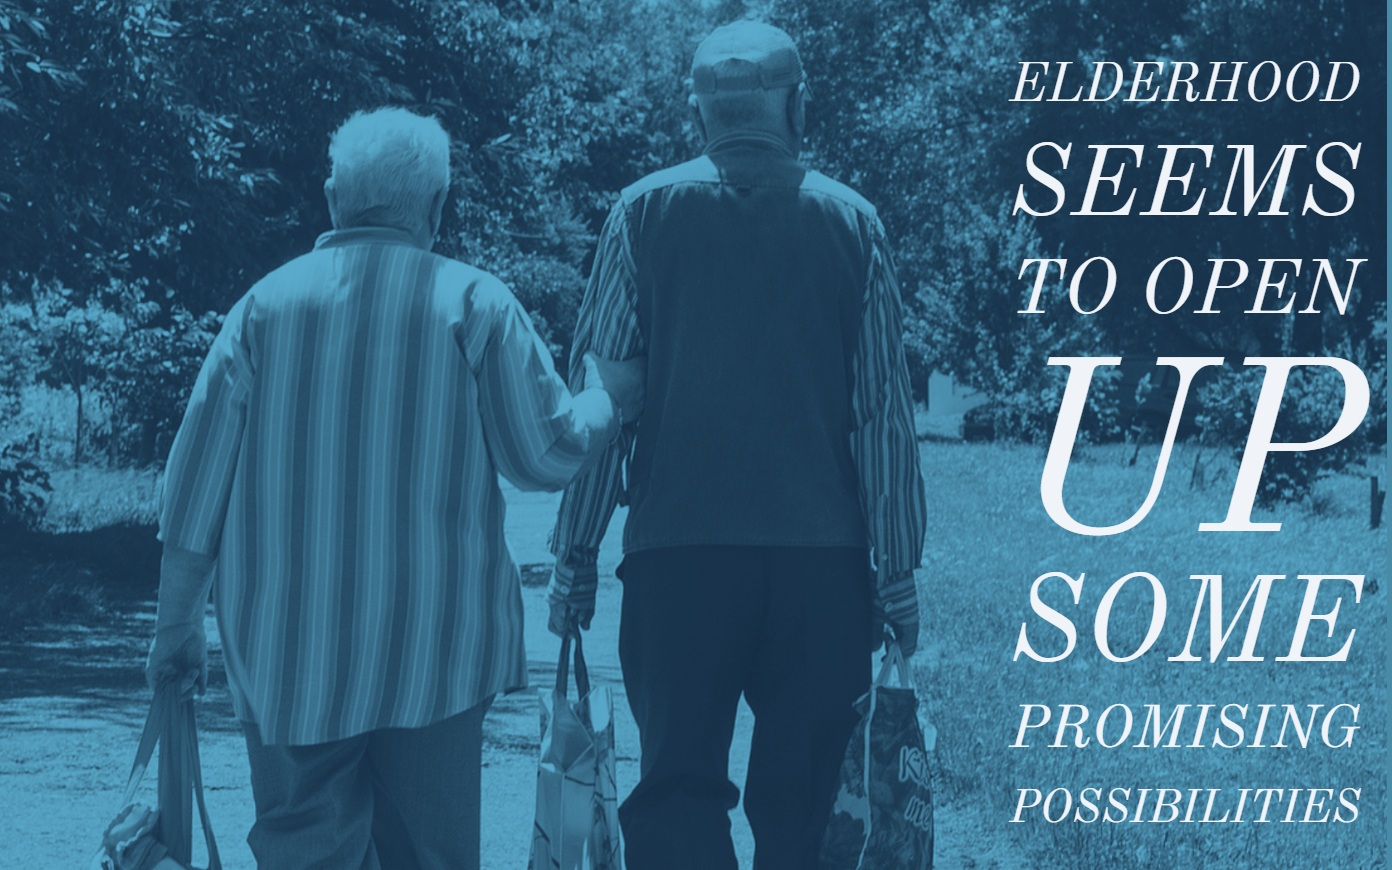 Elderhood.jpg